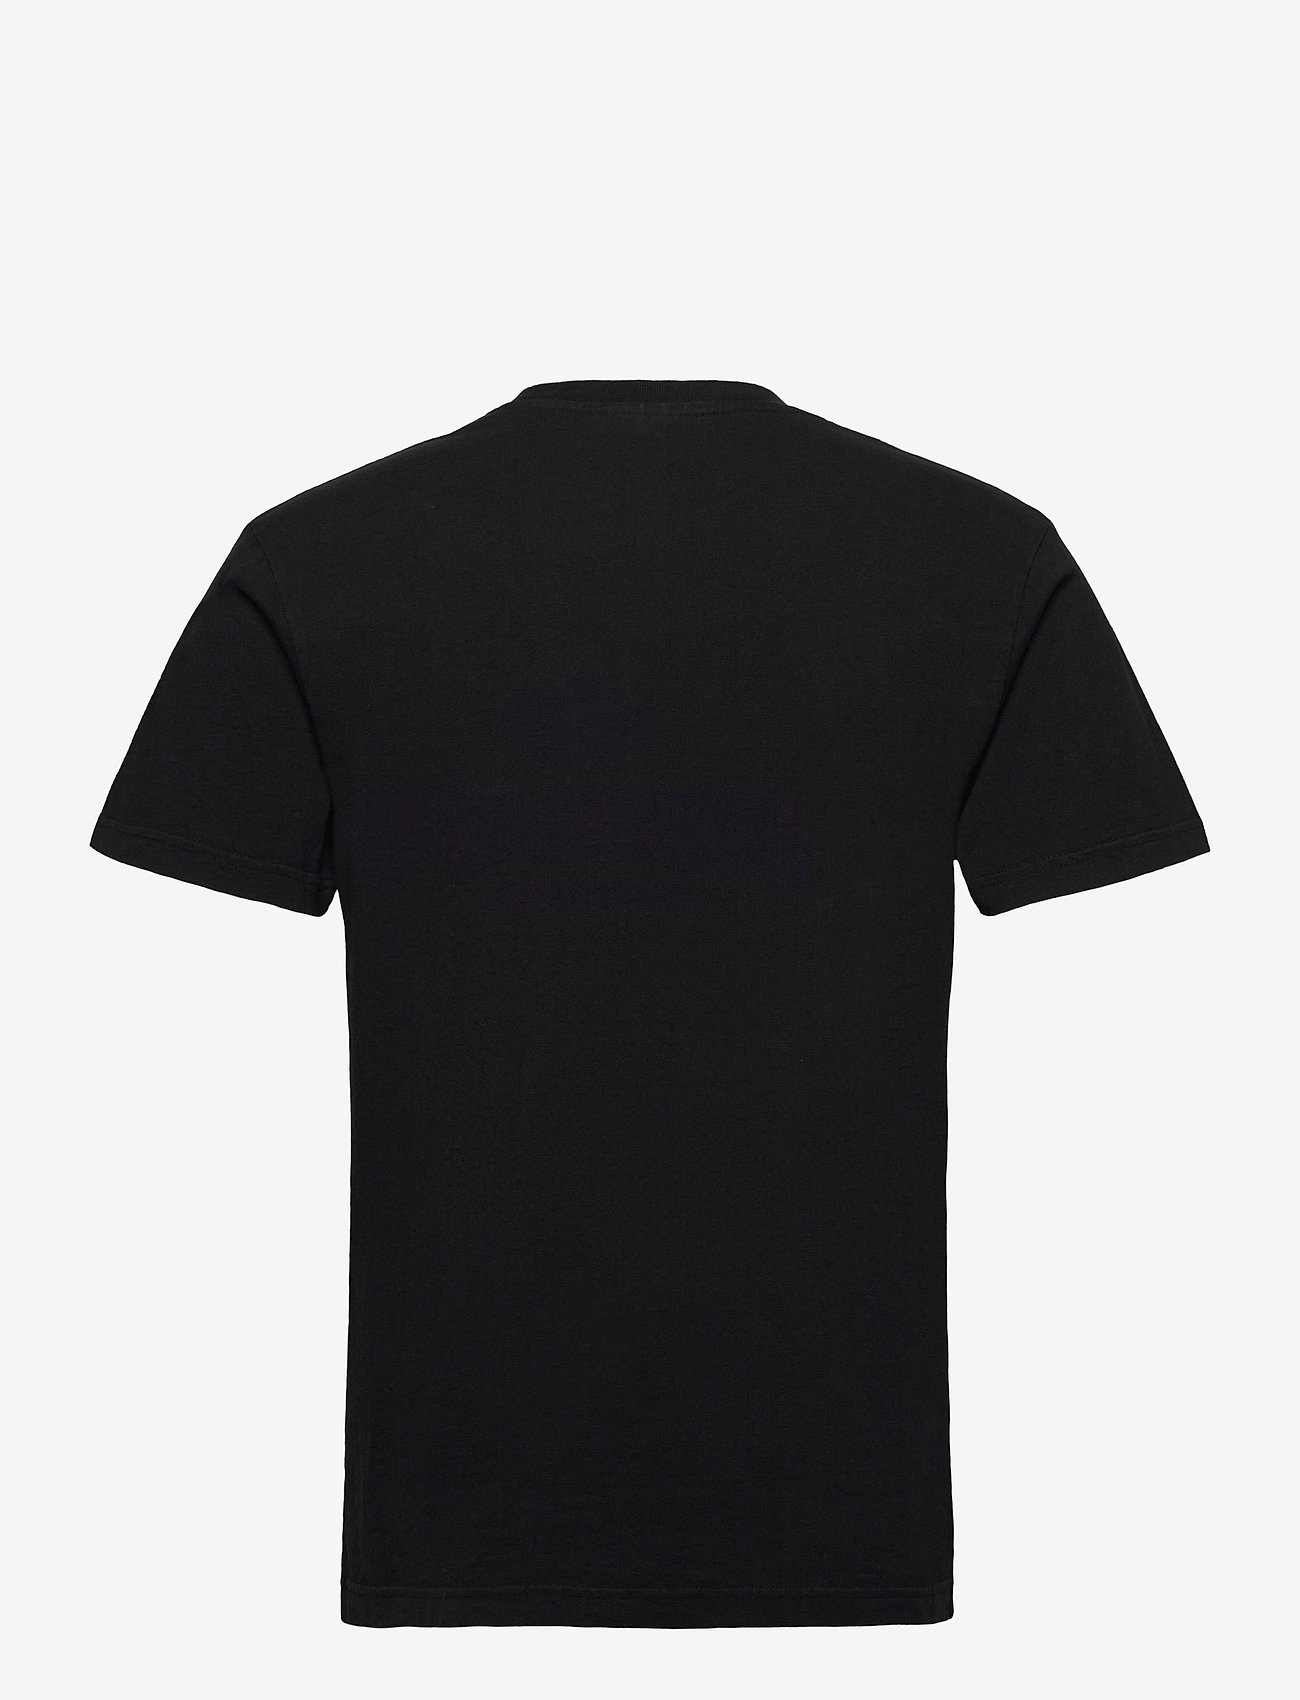 HAN Kjøbenhavn - Artwork Tee - korte mouwen - faded black - 2